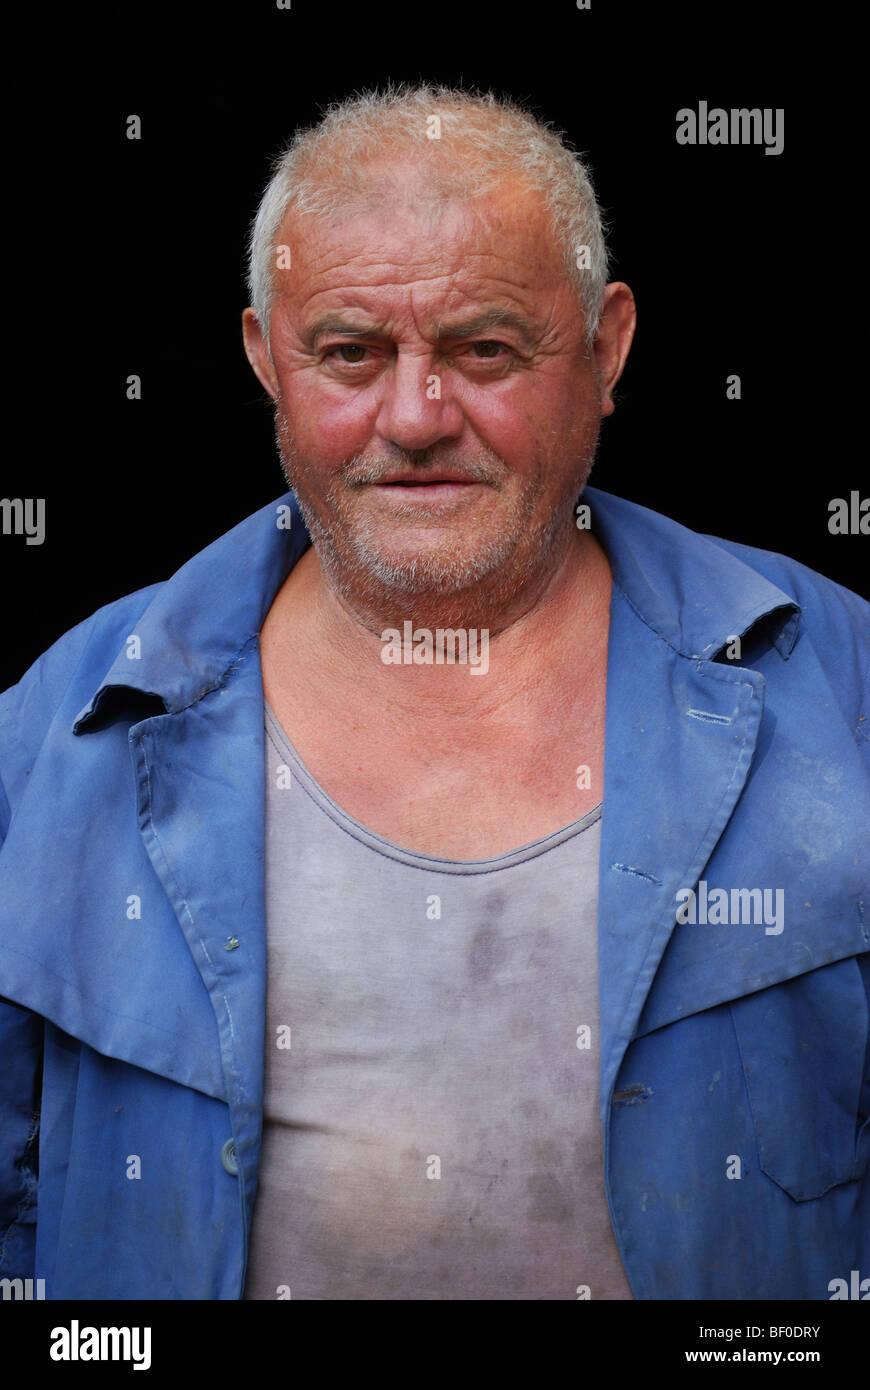 Porträt eines Mannes aus Padjene, Kroatien Stockbild